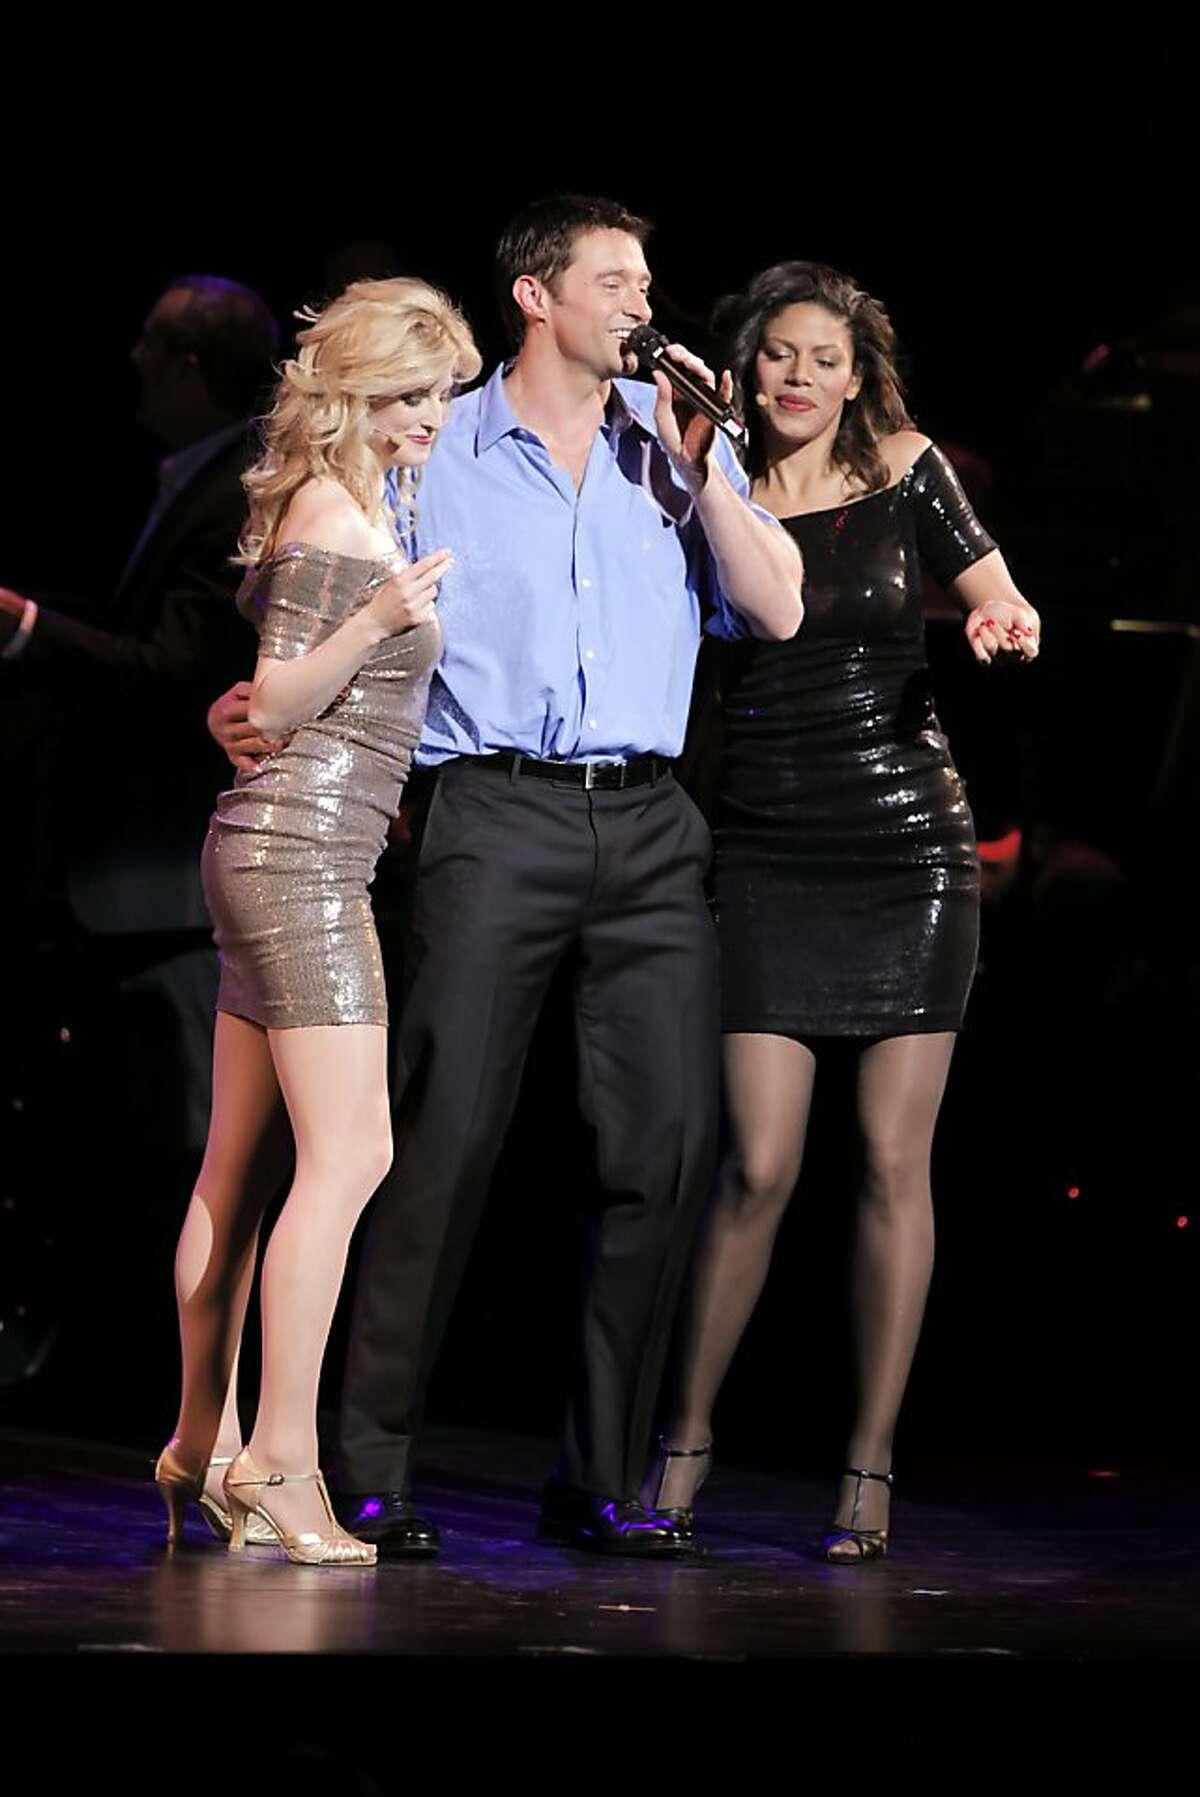 Dress rehearsal of Hugh Jackman in Performance at the Curran Theater in San Francisco, Calif., on Monday, May 2, 2011. L-R, Angel Reda, Hugh Jackman, and Merle Dandridge.